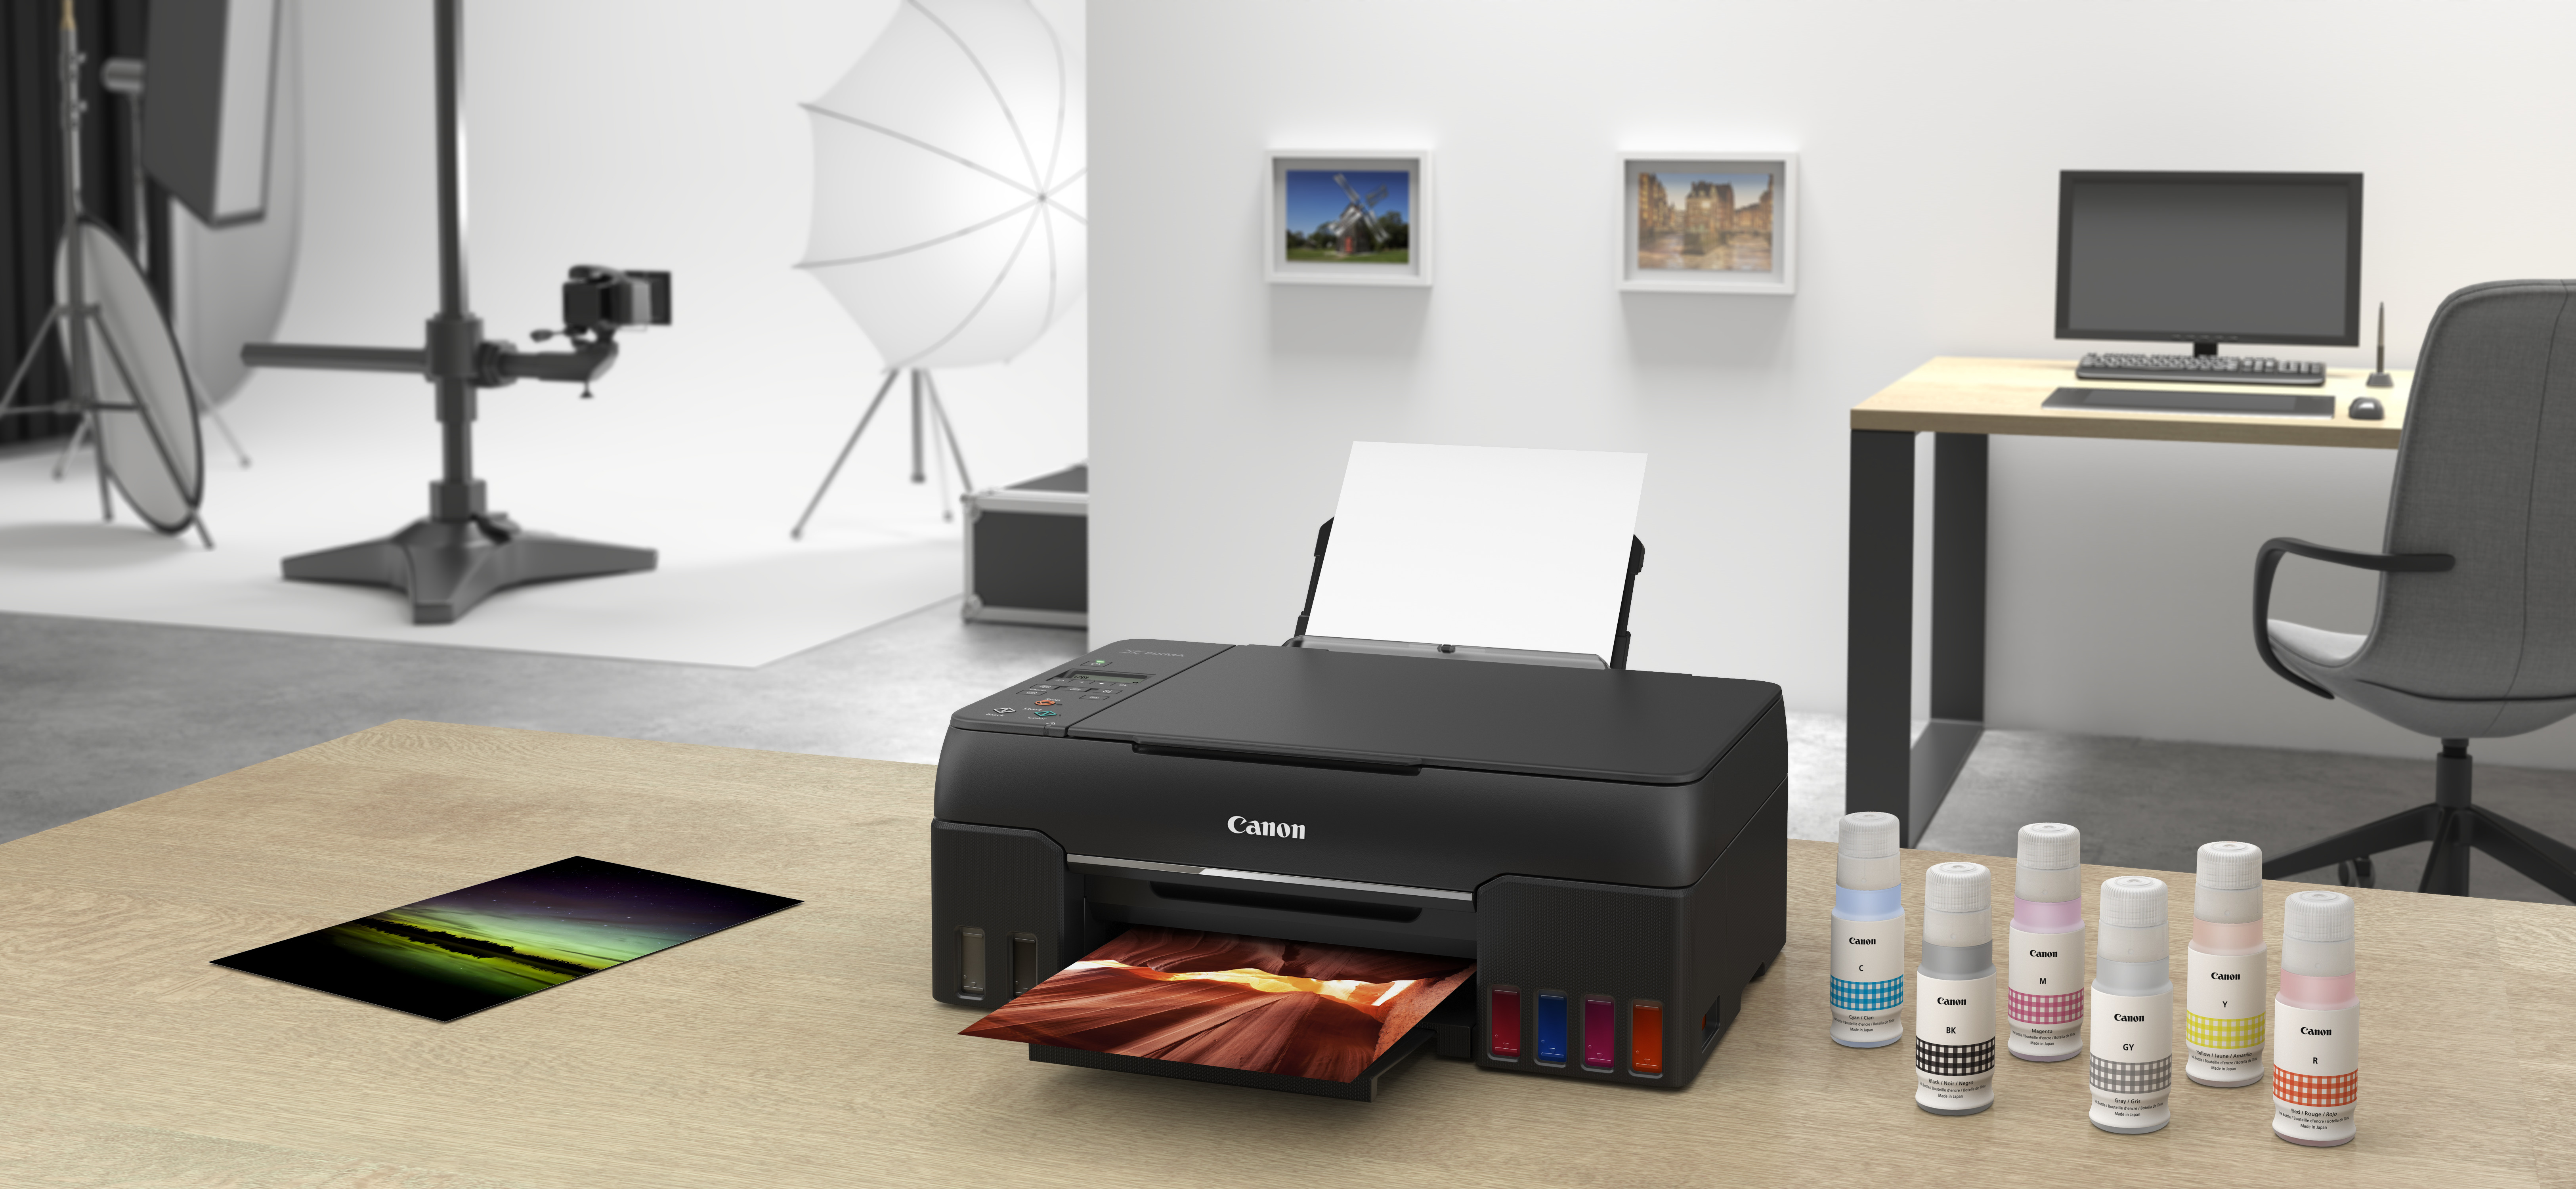 Nowa generacja drukarek Canon z systemem MegaTank – jakość i ilość